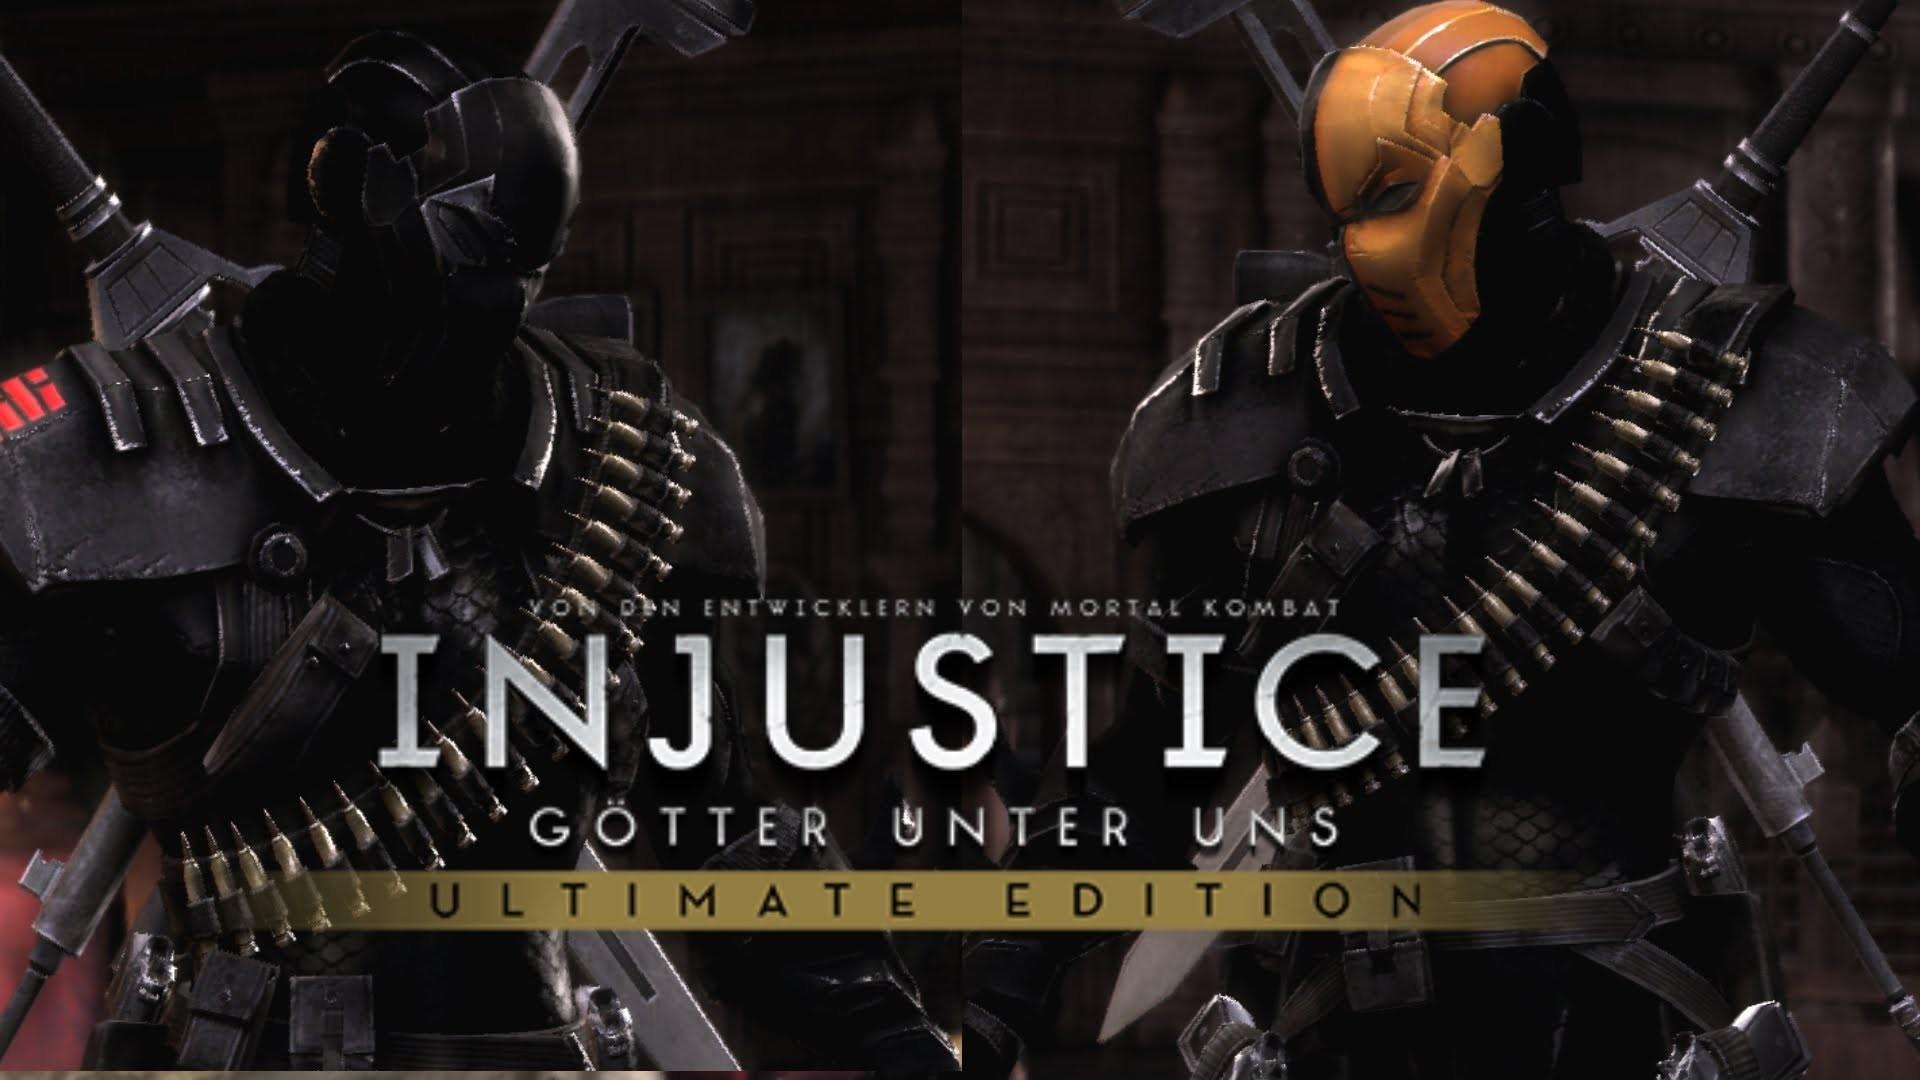 Res: 1920x1080, Injustice Ultimate Edition PC | Deathstroke (Snake Eyes) vs Deathstroke  (Arrow Season 2) Skin Mod - YouTube